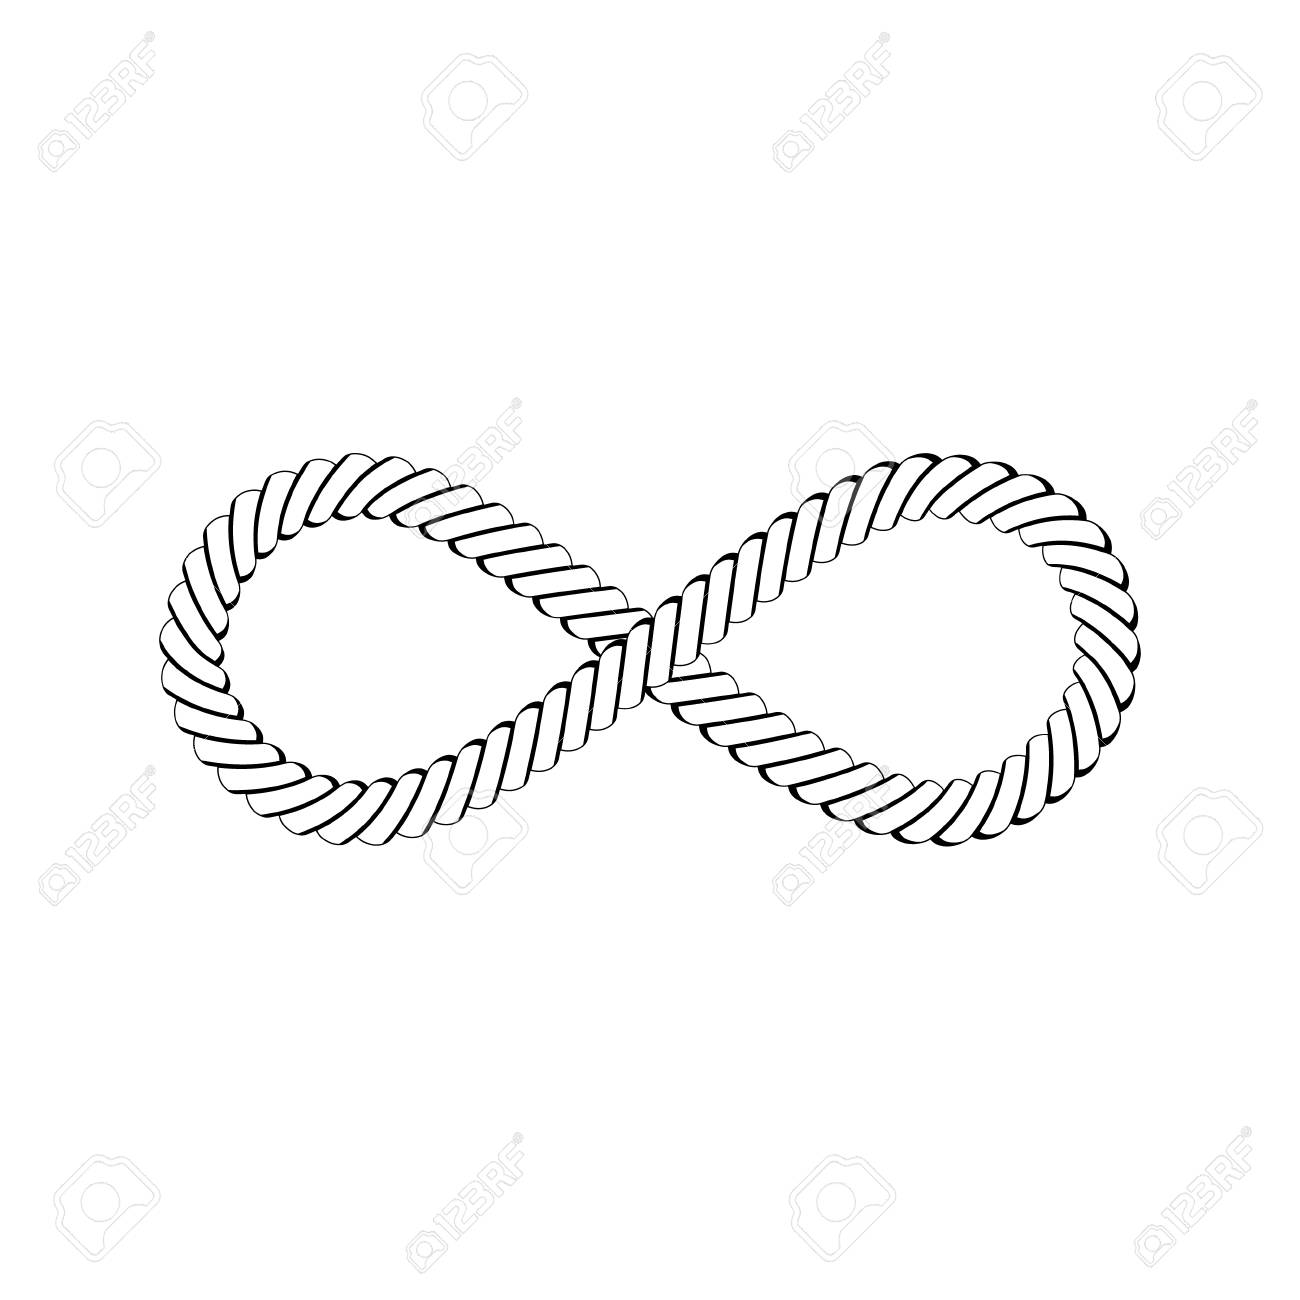 Vector illustration nautical rope knots decorative vintage element.